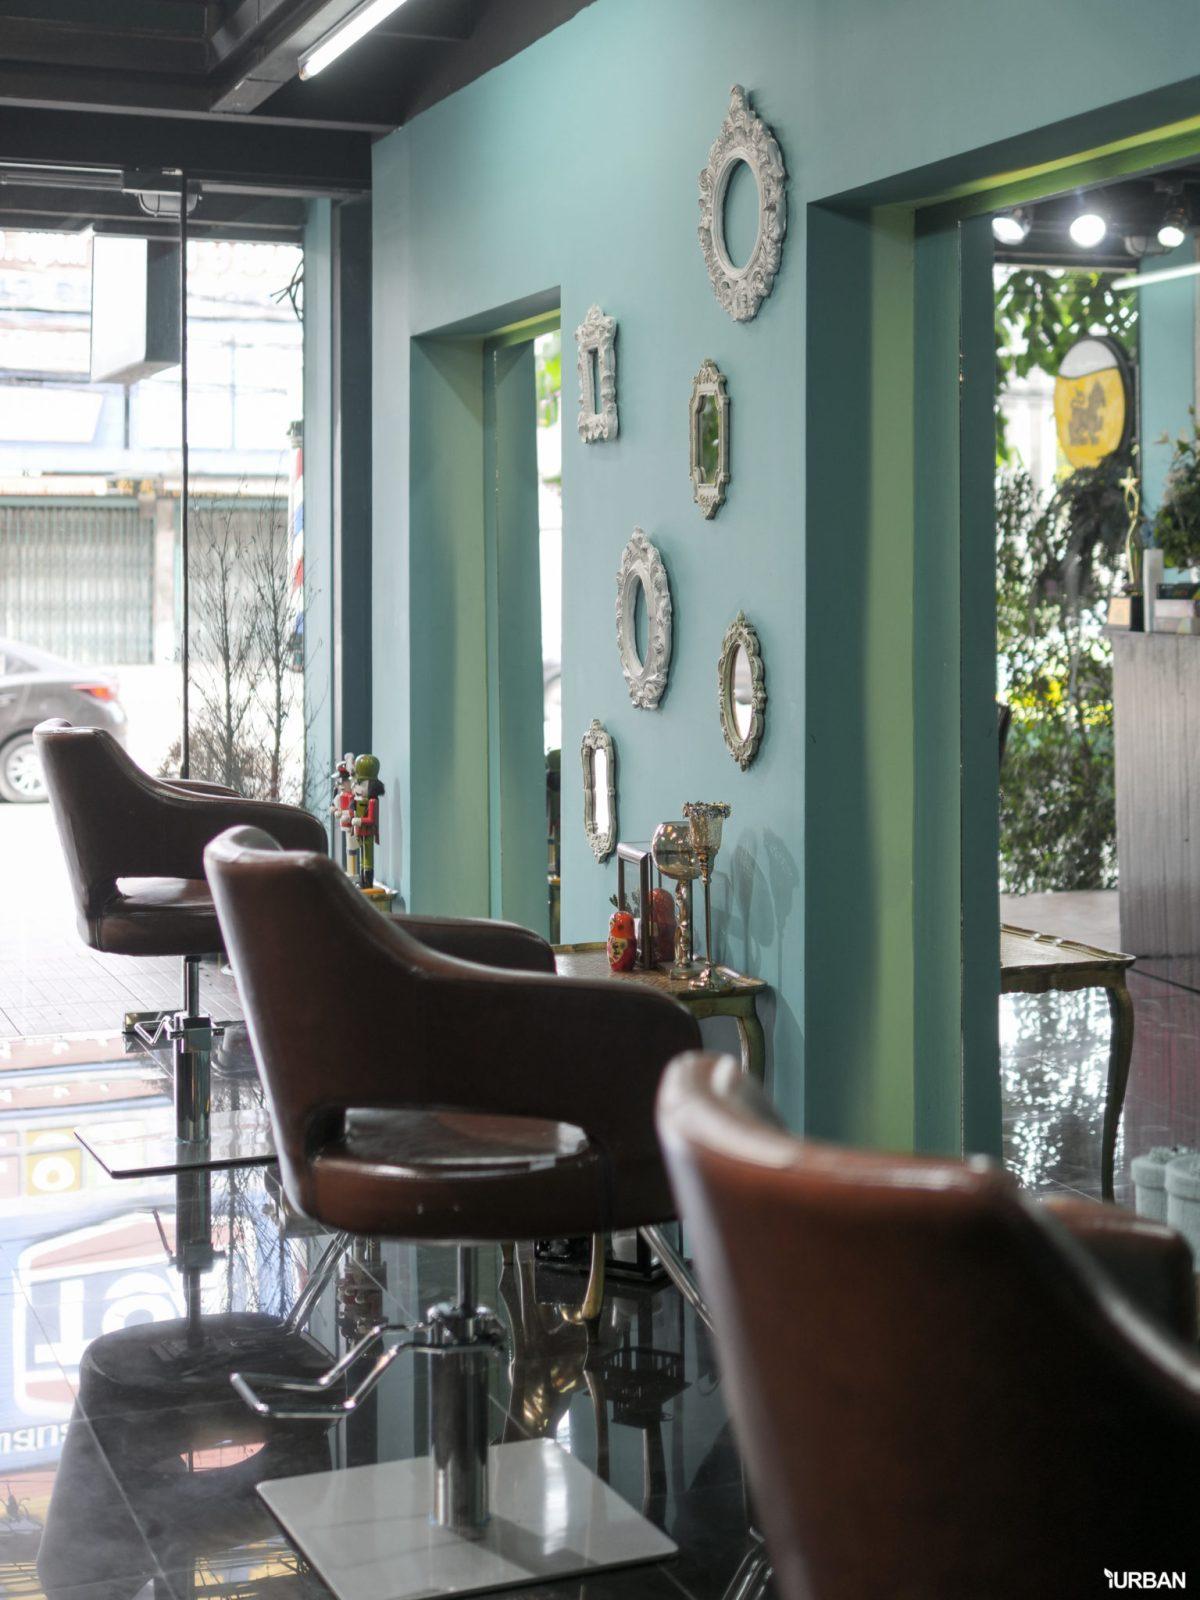 "7 Simply Creative Cafe & Bar ในย่านไลฟ์สไลต์สุดฮิป กับ 24 Hr. Co-Working Space กลาง New Interchange ""รัชดา - ลาดพร้าว"" 63 - cafe"